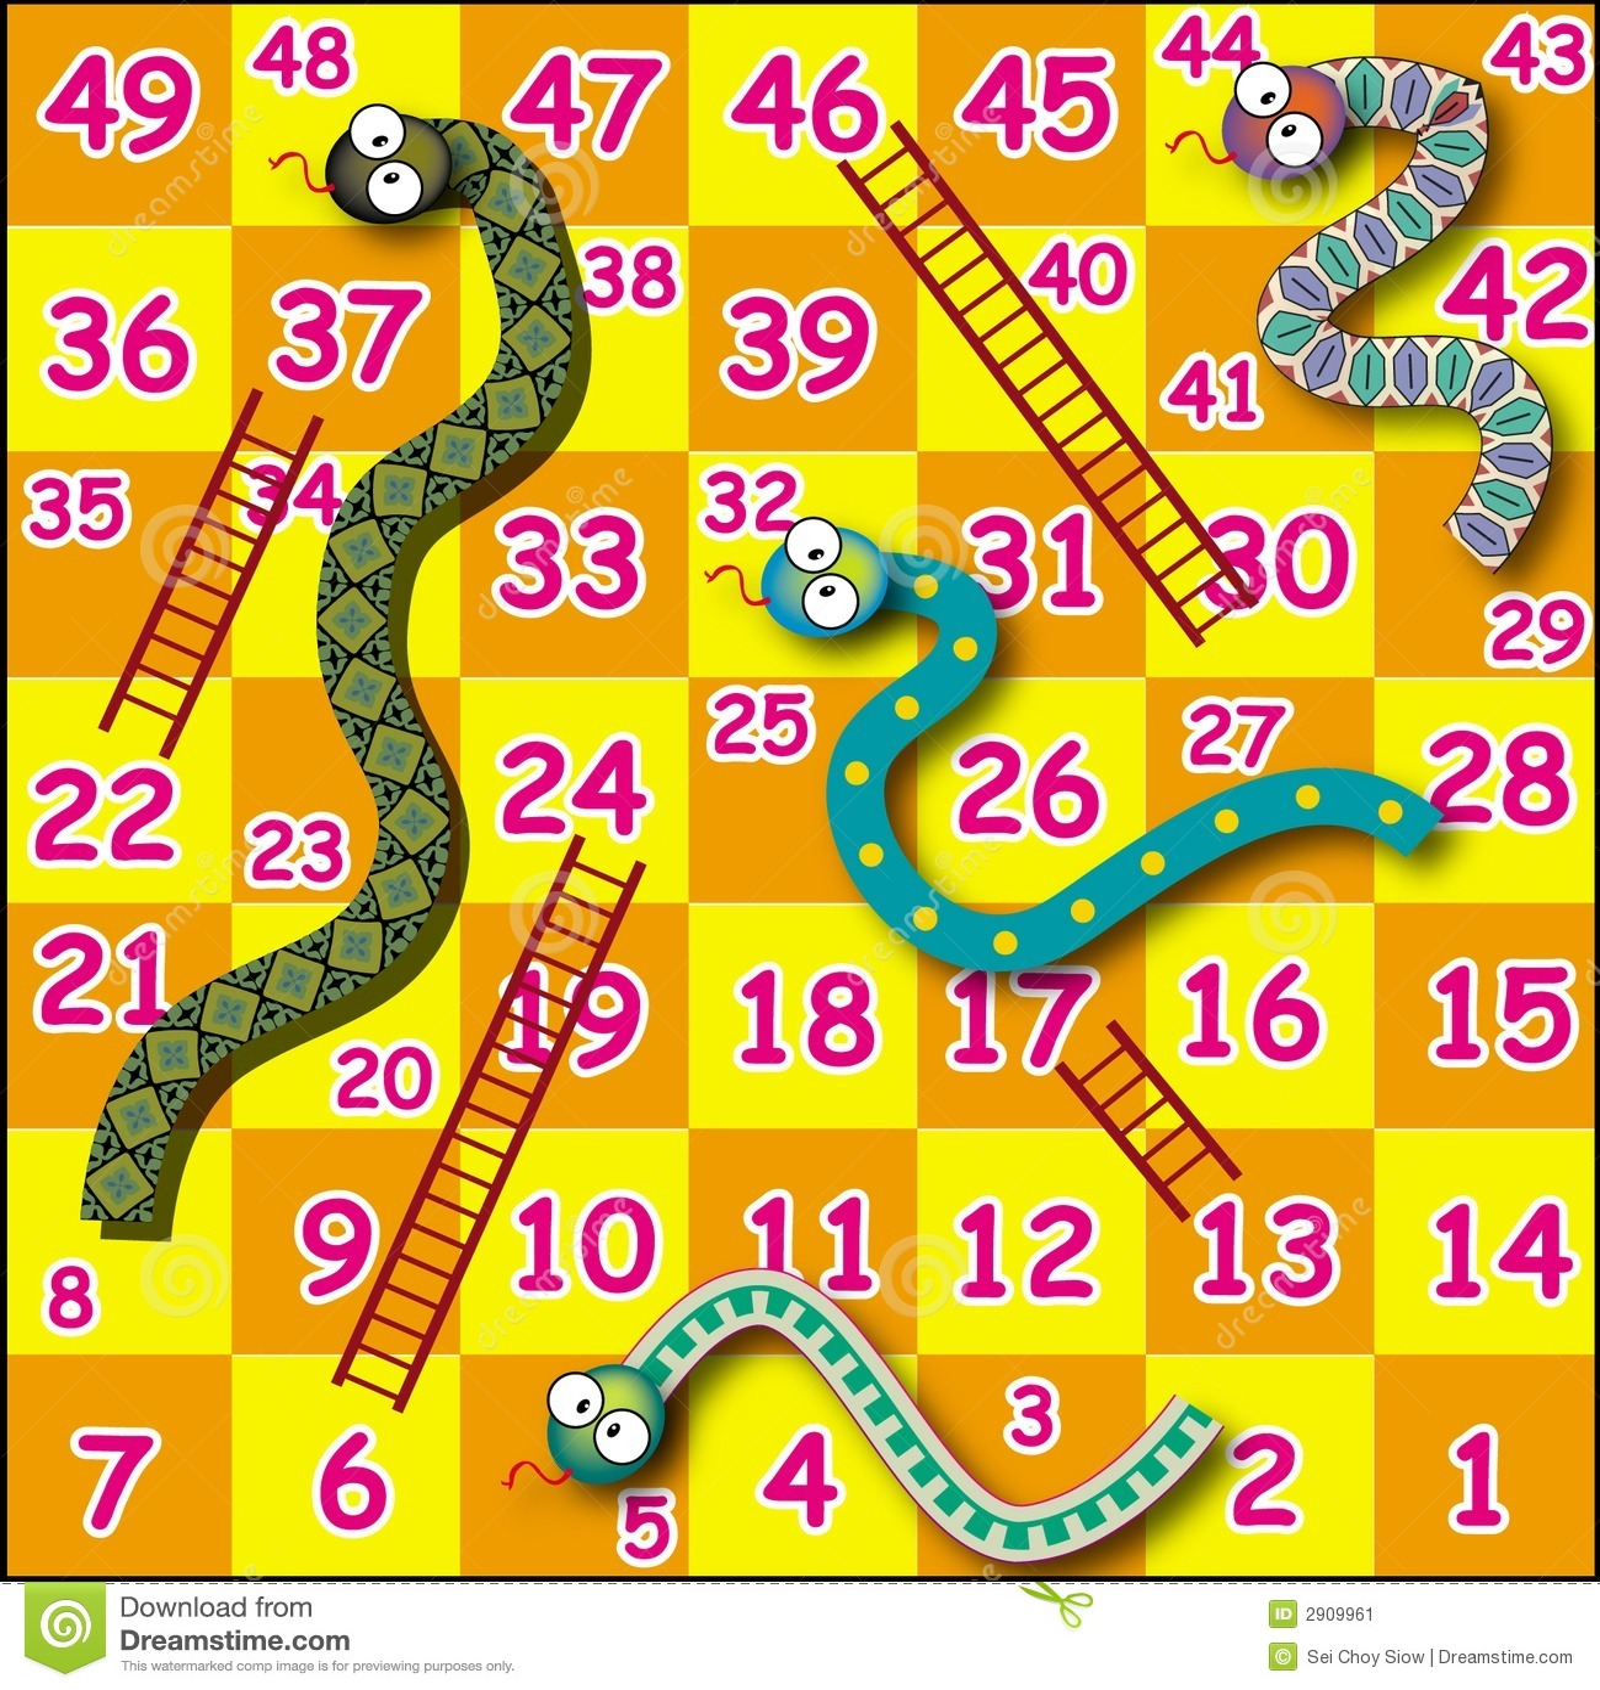 One of children favorites games.